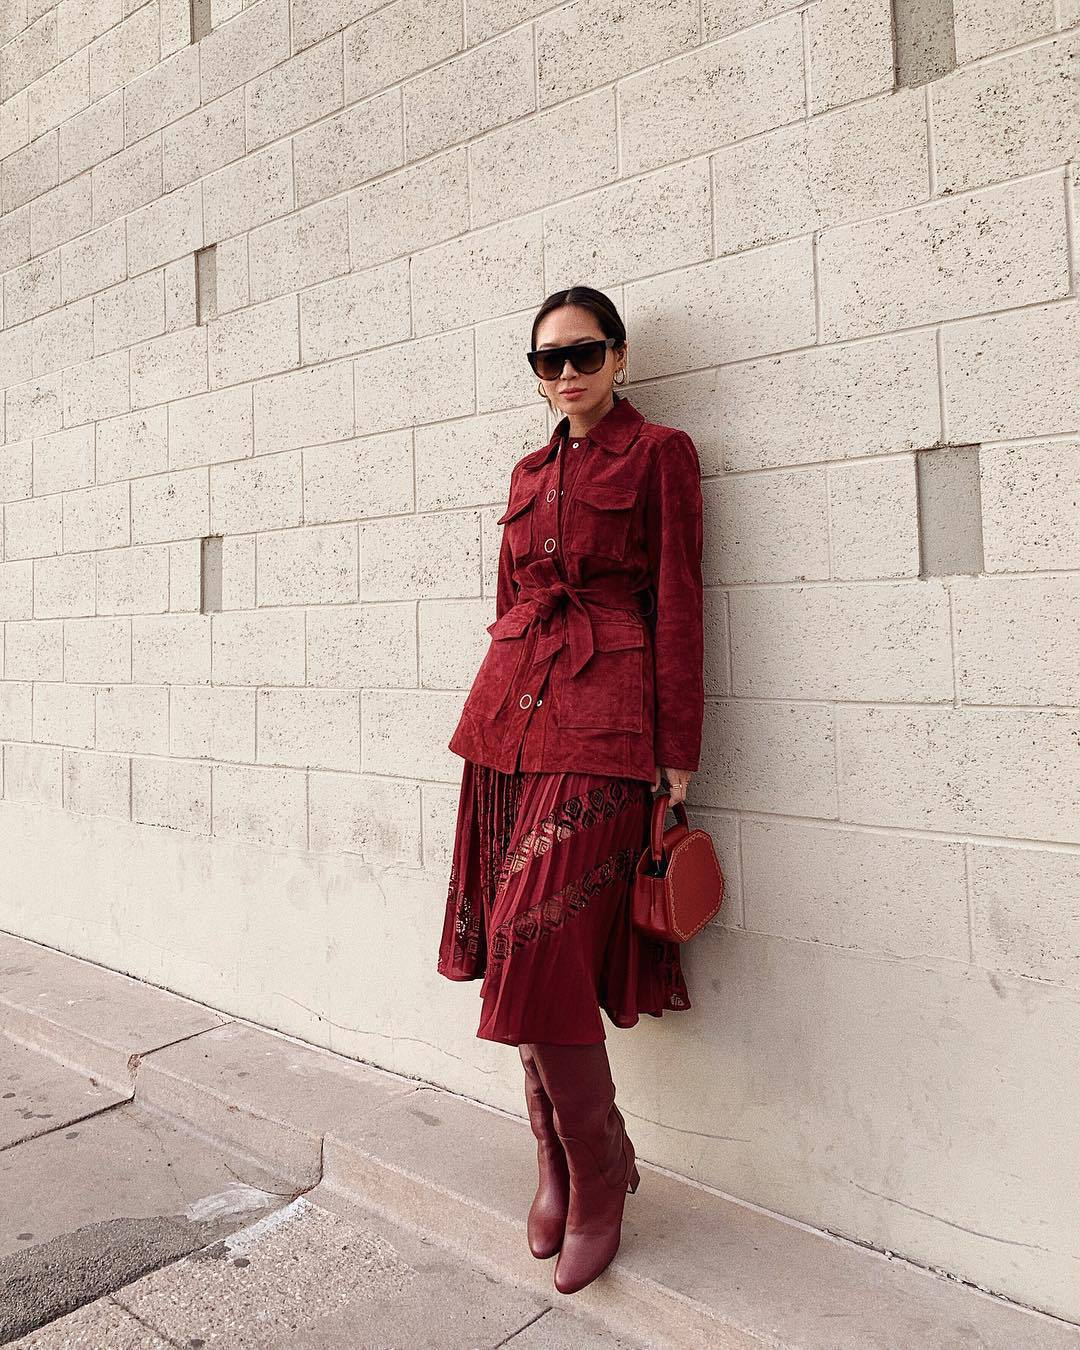 skirt pleated skirt midi skirt red skirt floral skirt knee high boots red boots red jacket top handbag